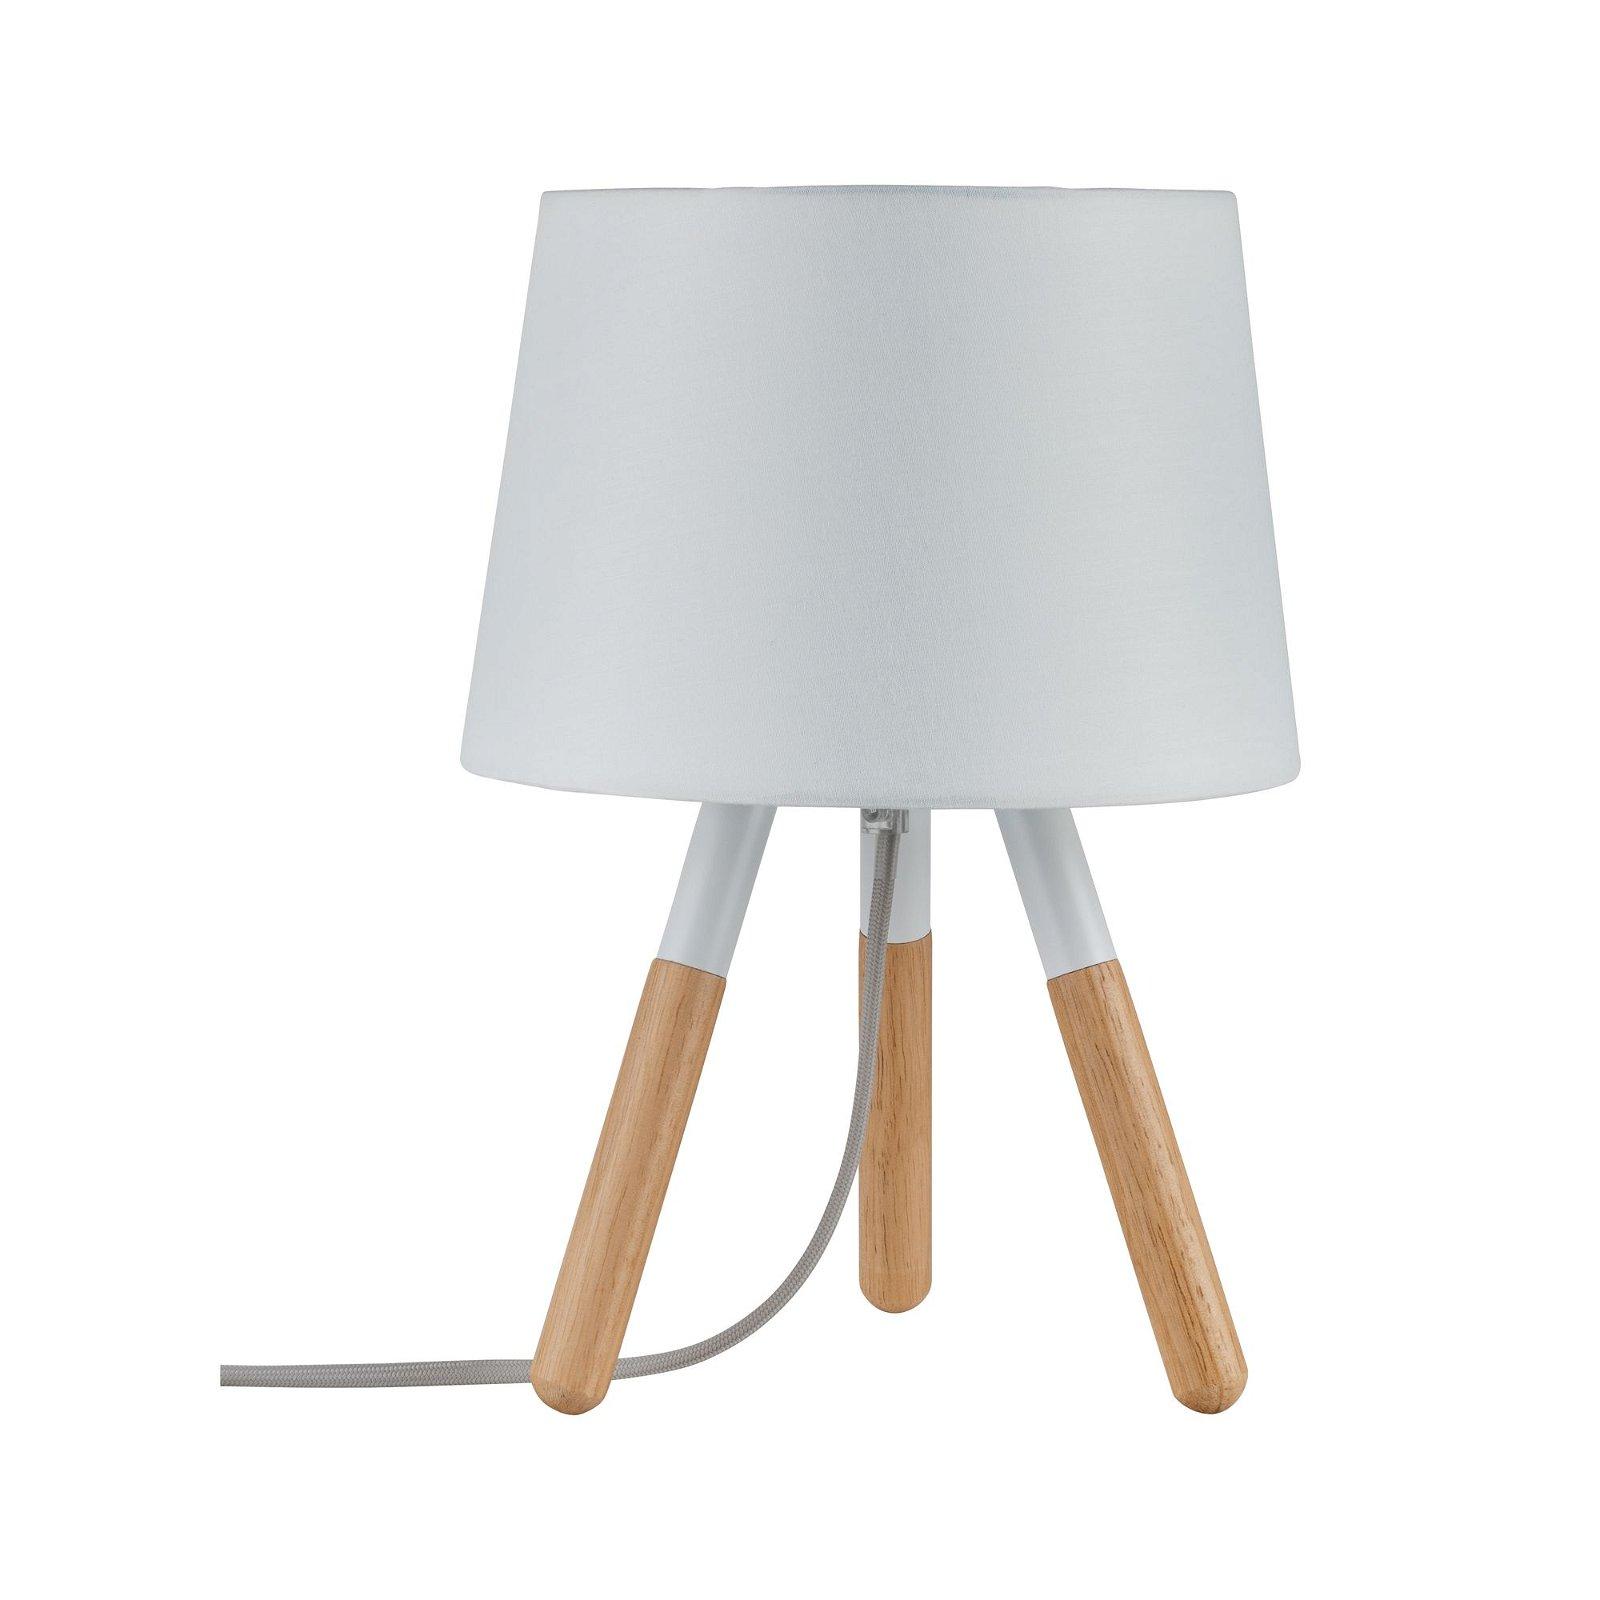 Neordic Tischleuchte Berit E27 max. 20W Weiß/Holz Stoff/Holz/Metall